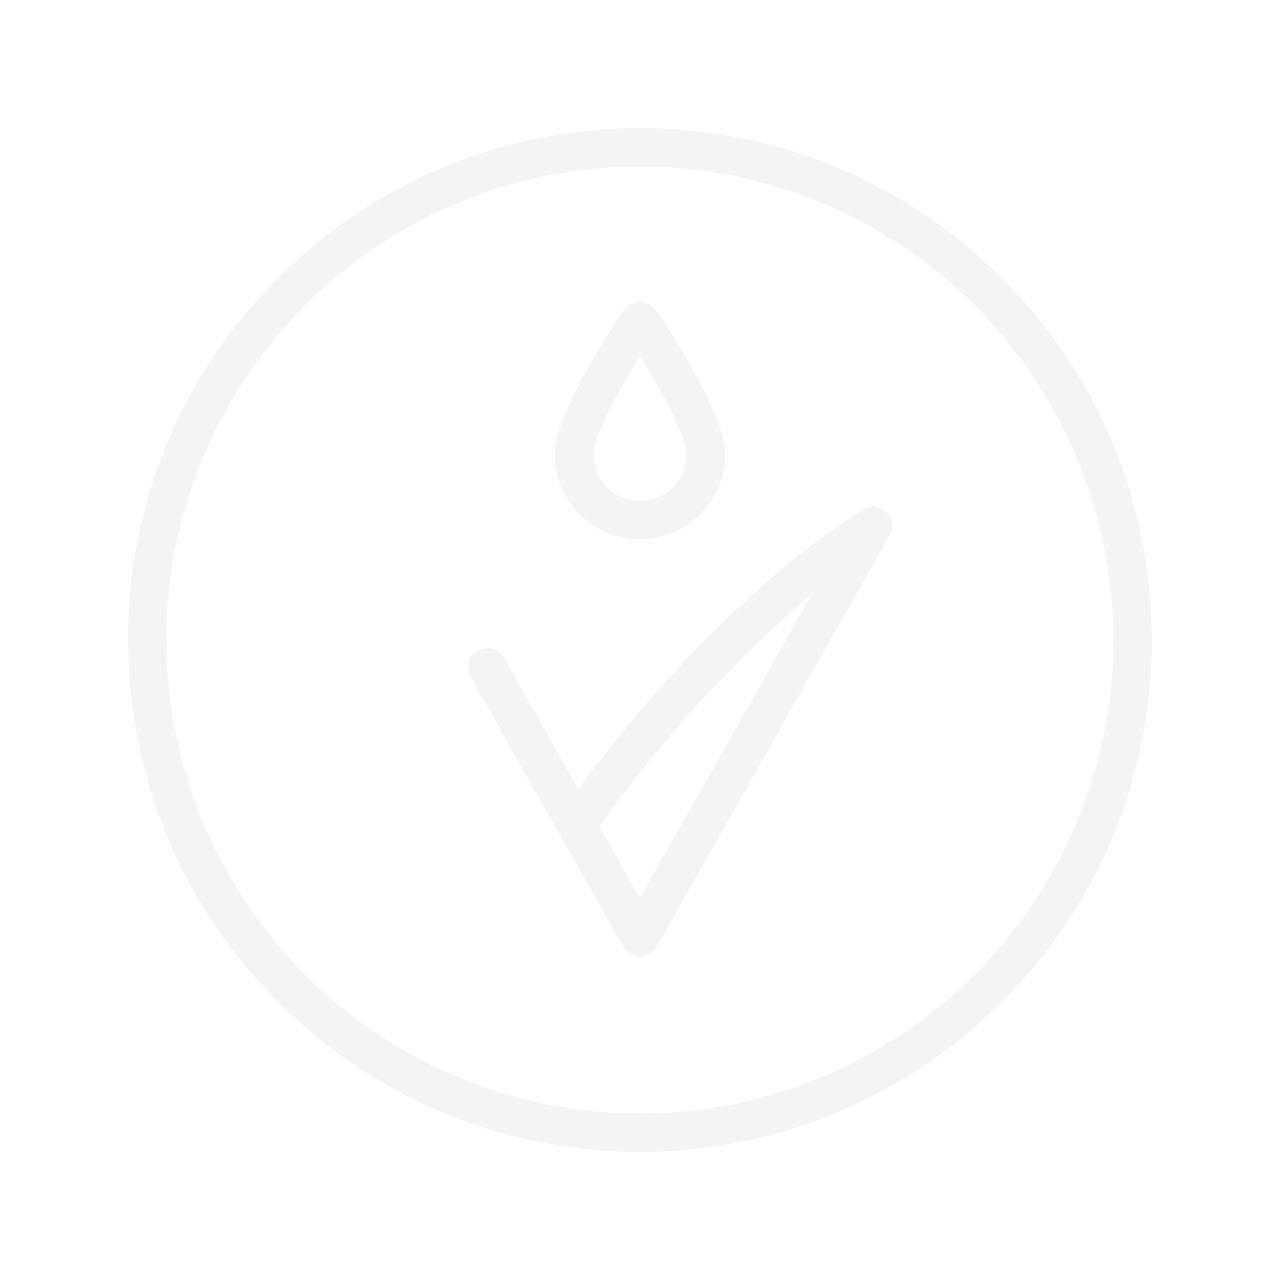 BIOTHERM Aquasource Intense Gel (Normal/Combination) 50ml